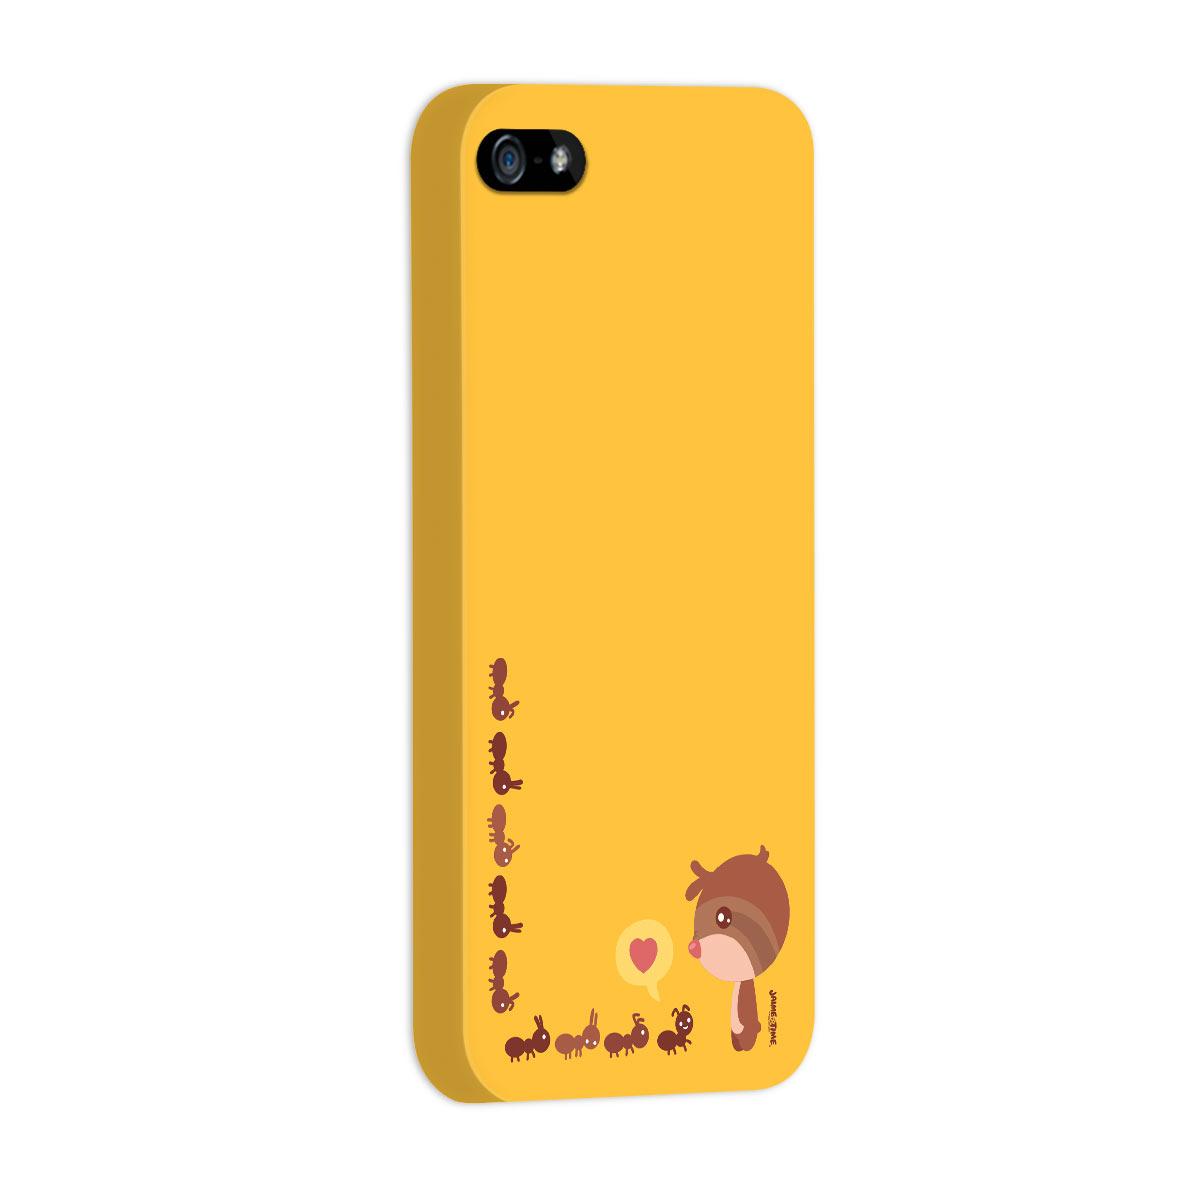 Capa para iPhone 5/5S Jaime Formigas